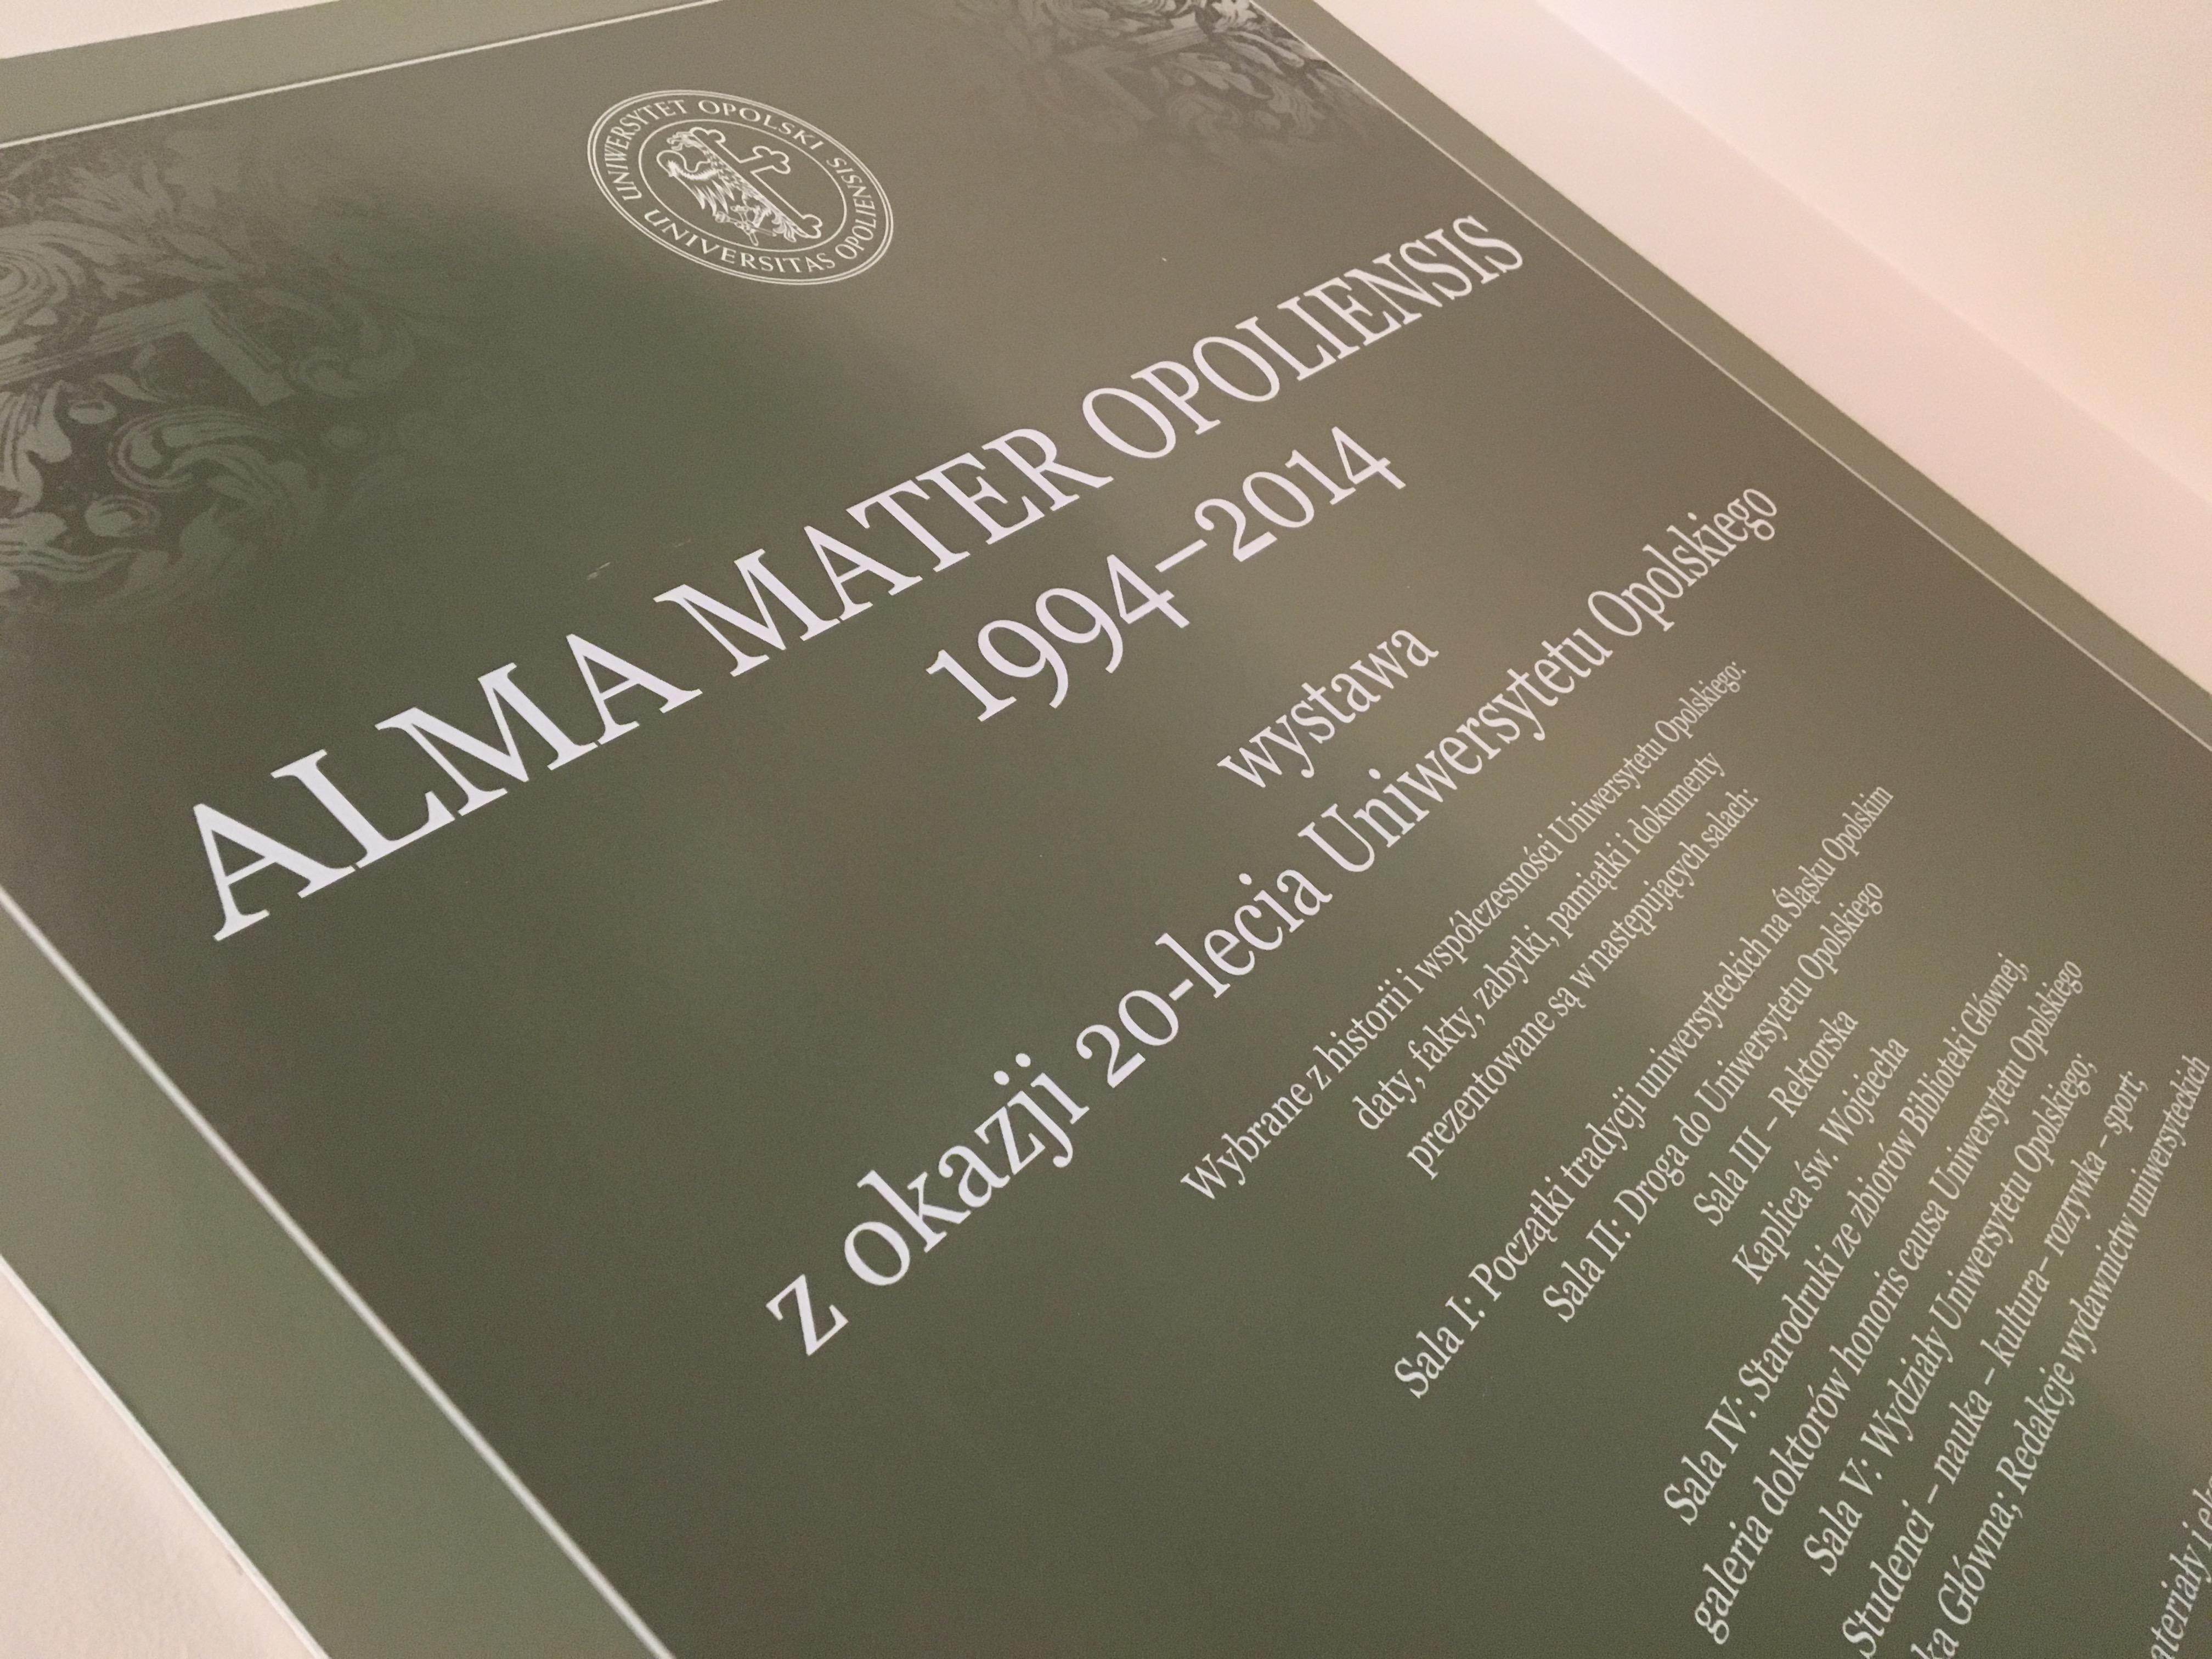 Alma Mater Opoliensis 1994-2014